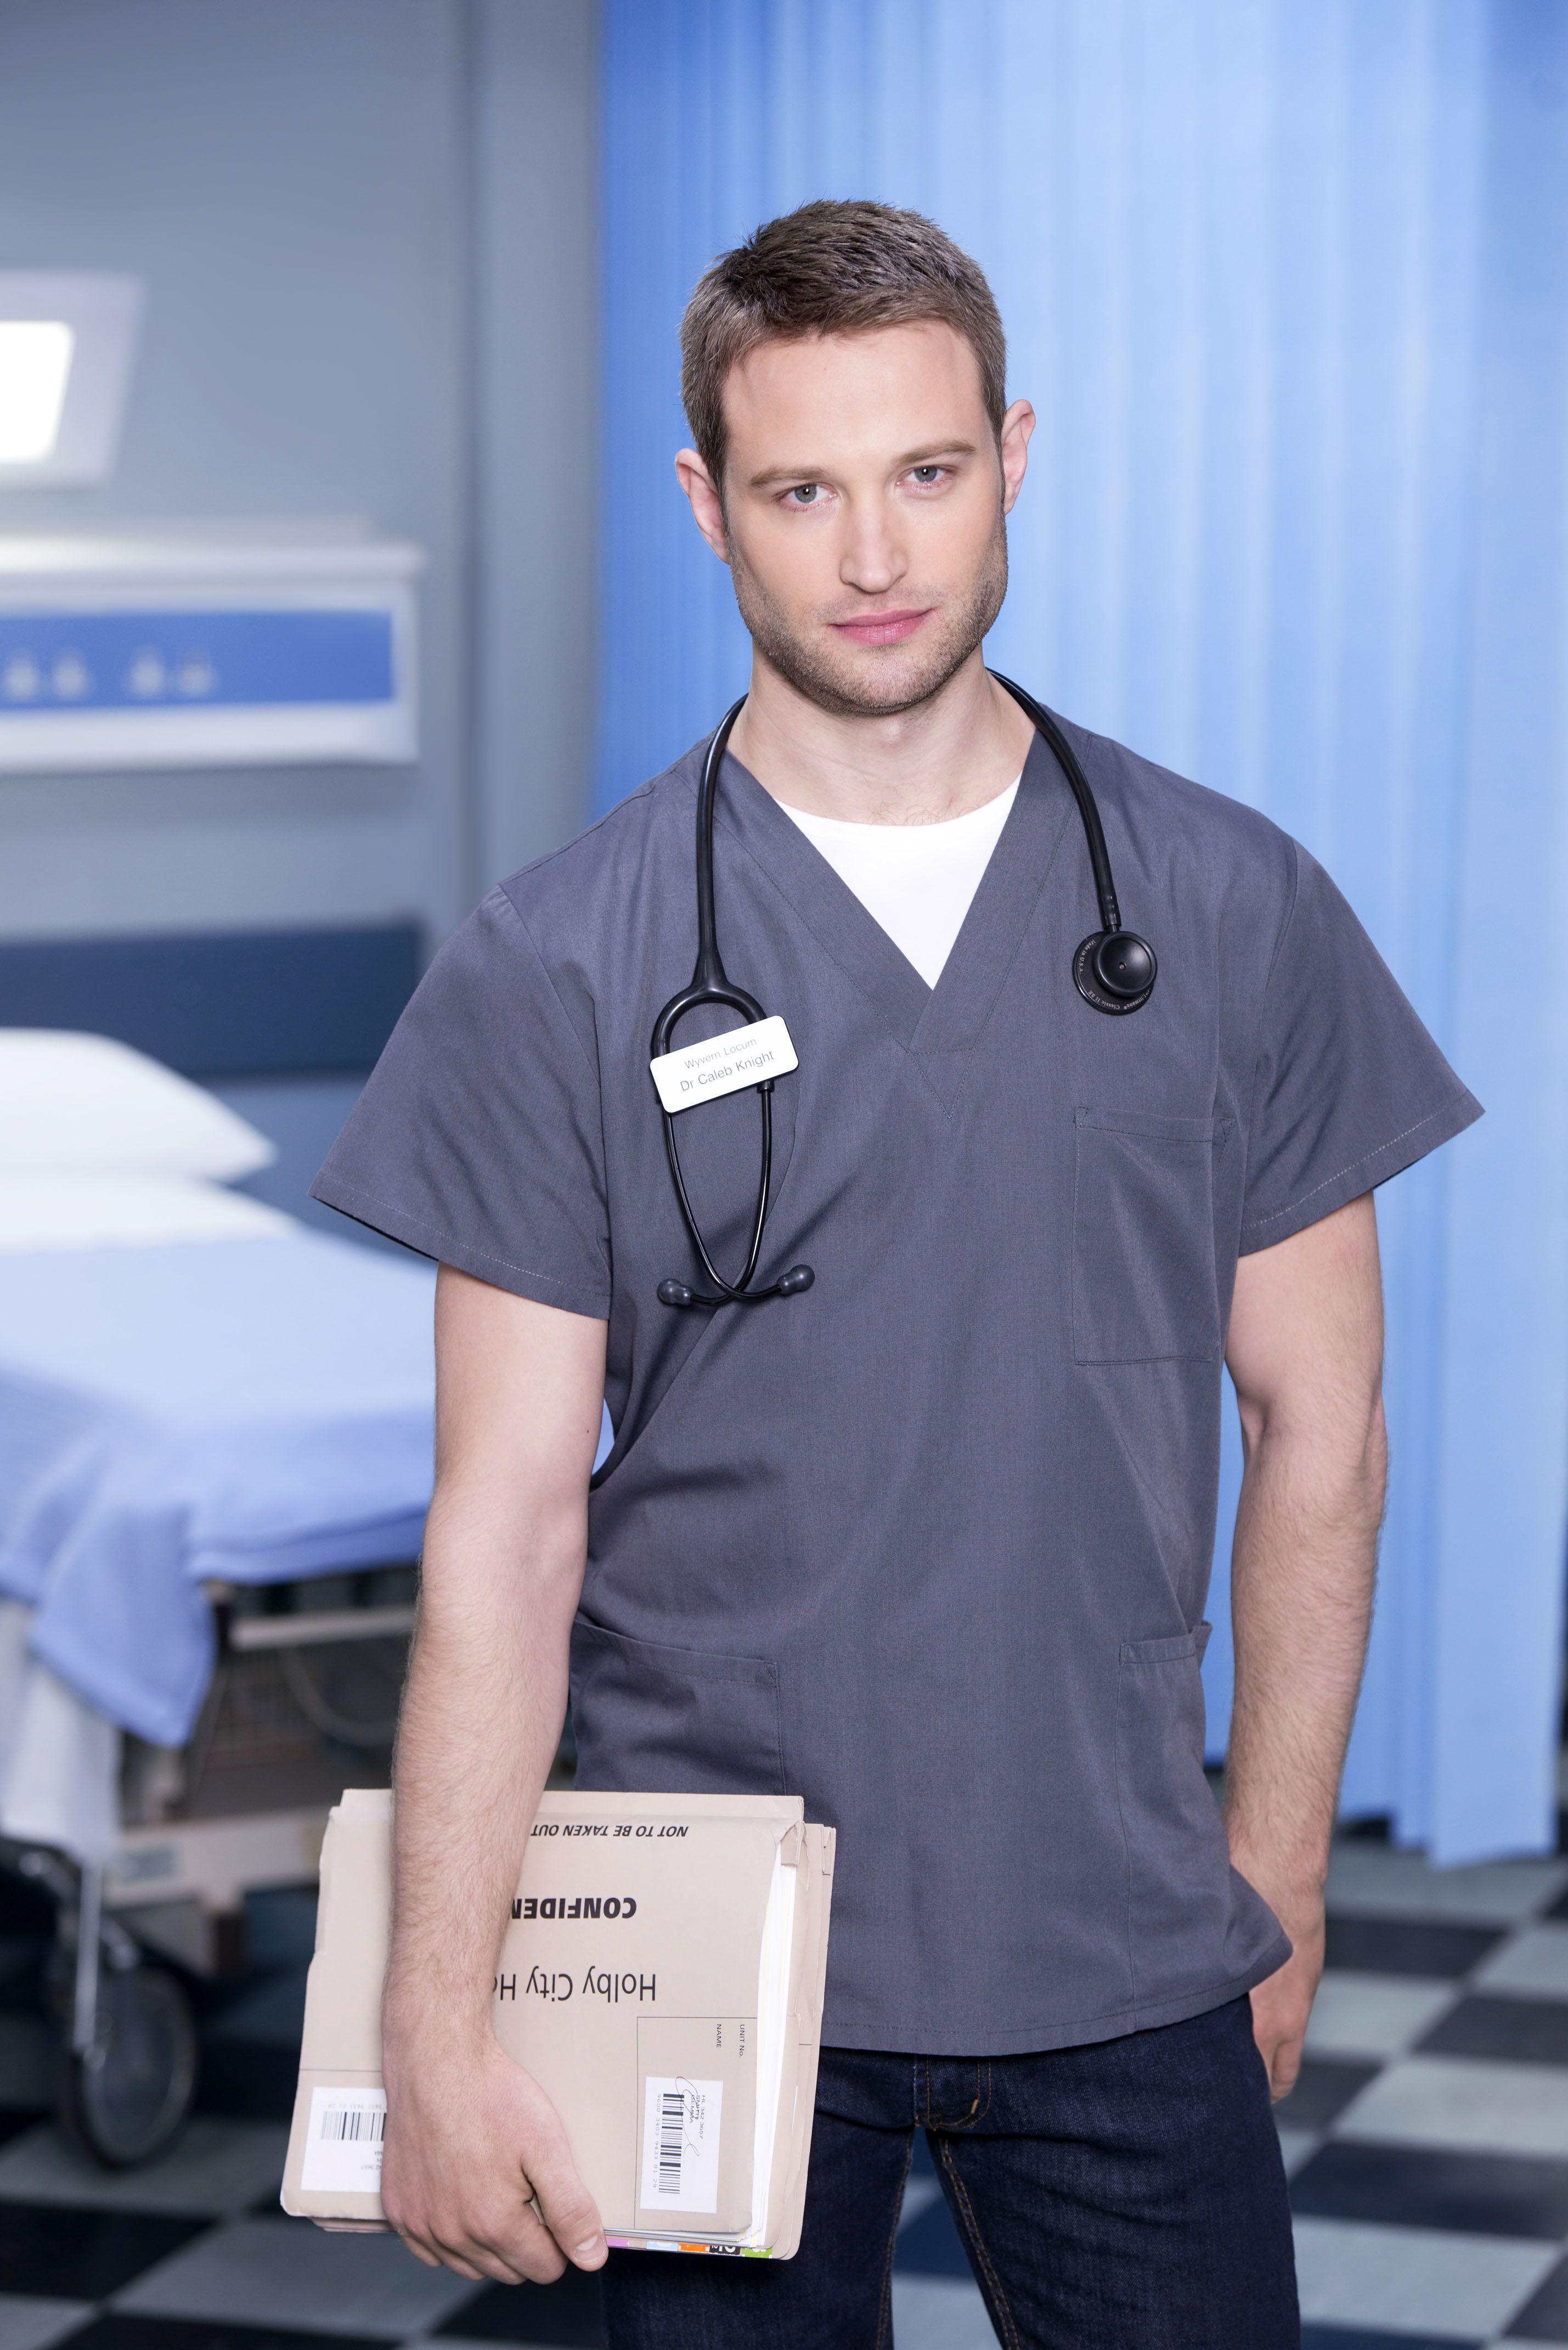 casualty richard winsor on playing new lothario medic caleb richard winsor interview